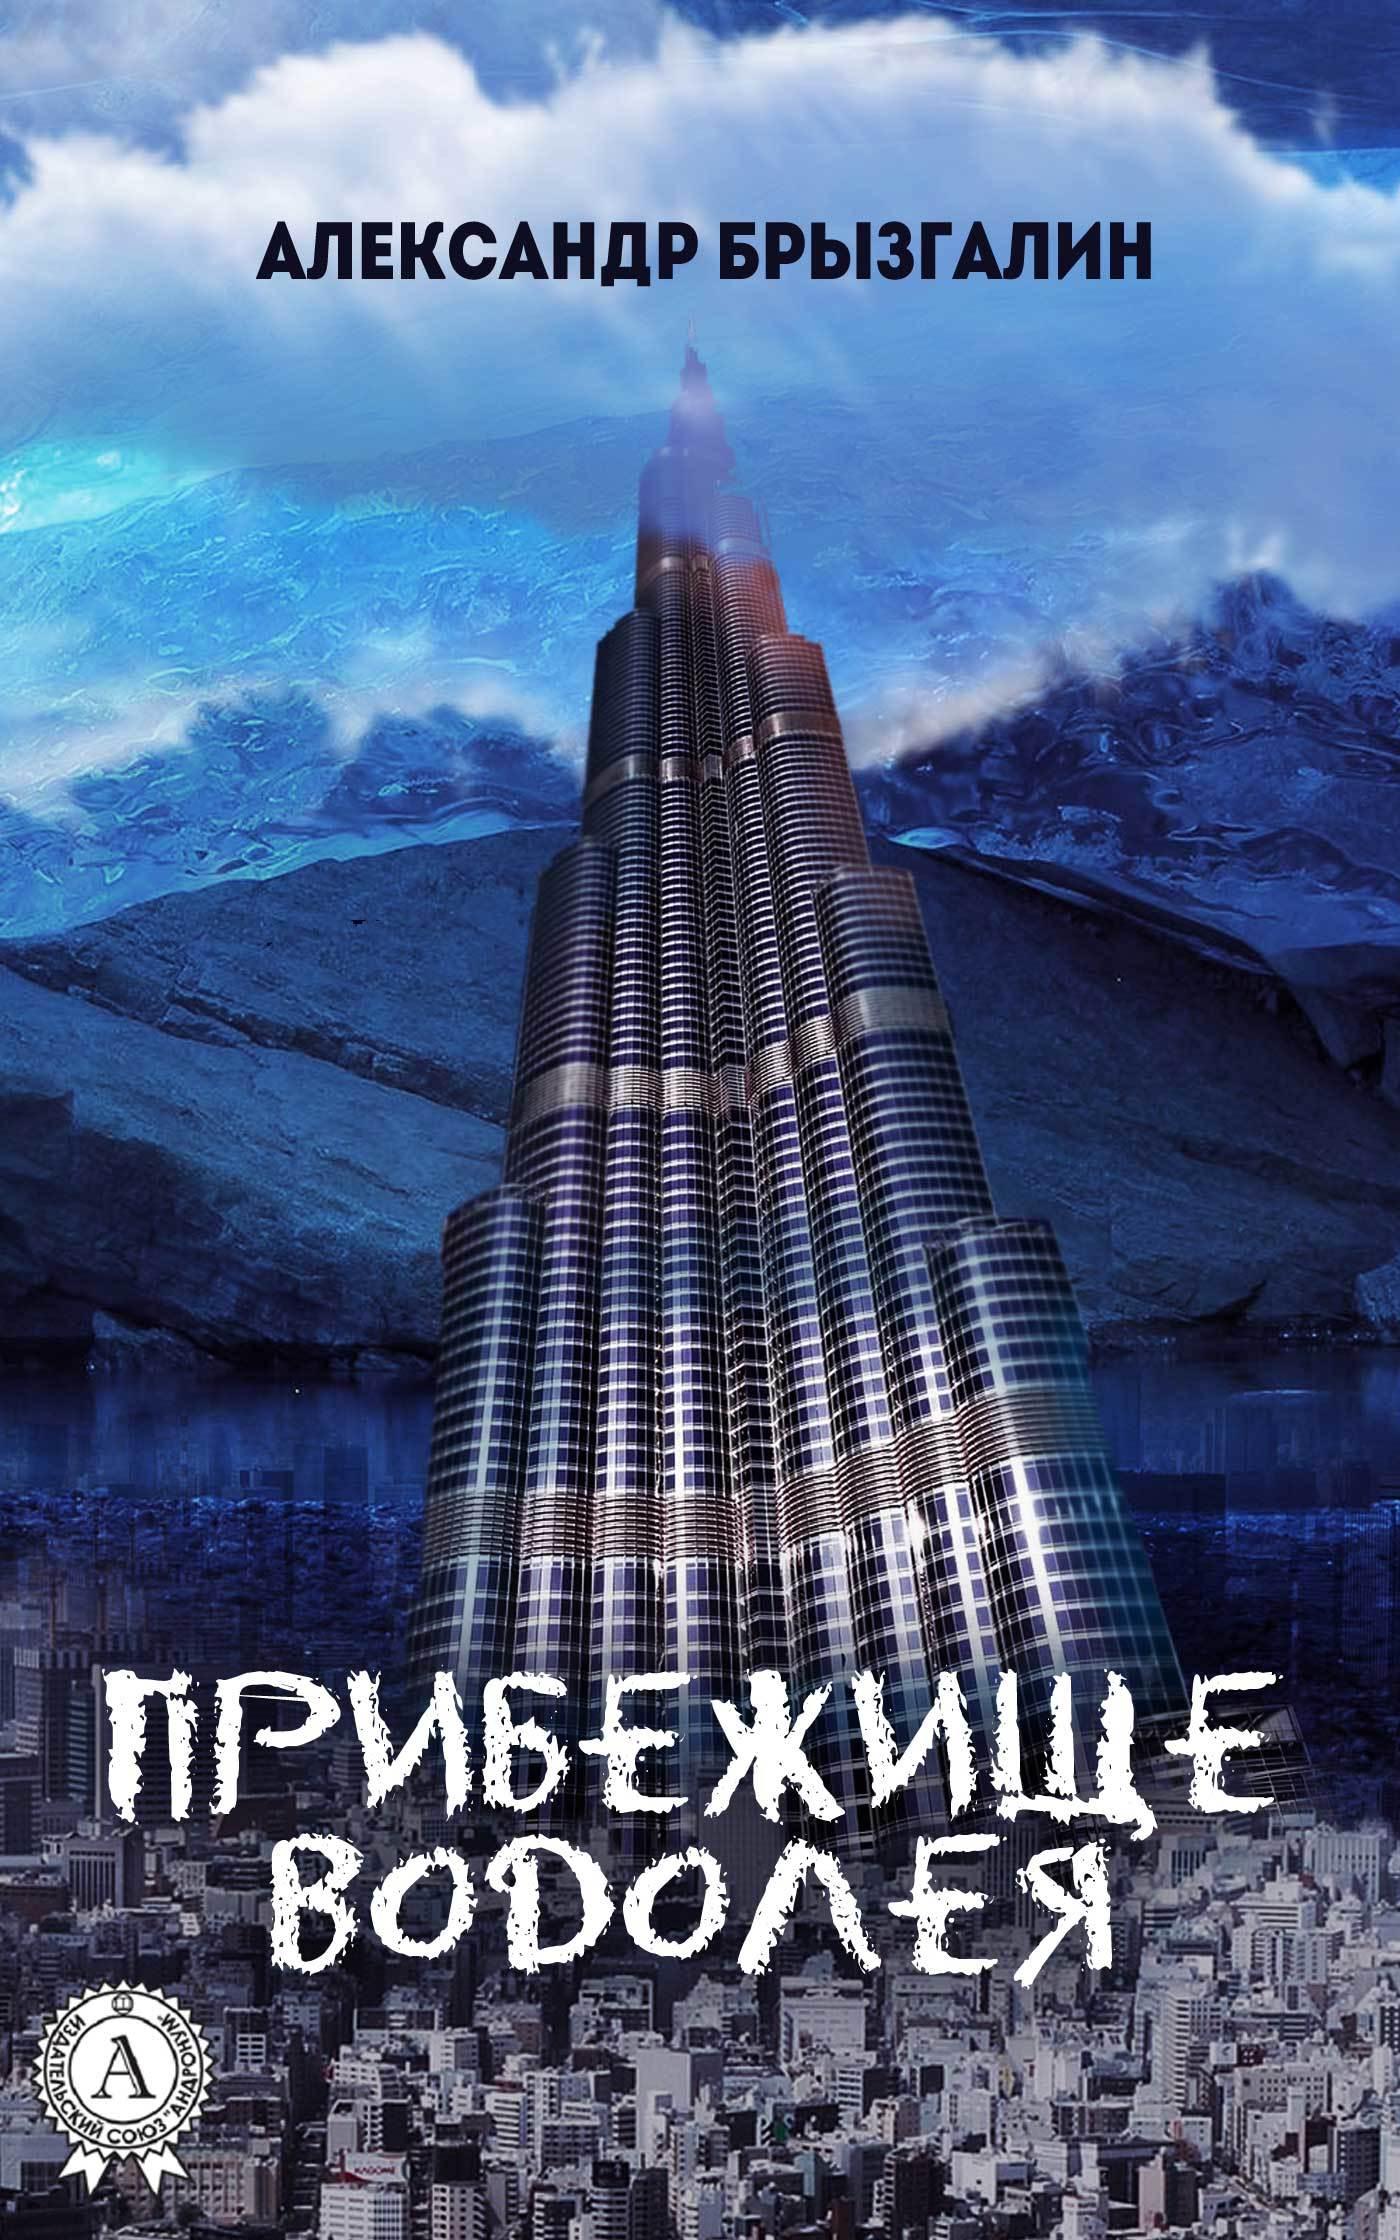 Александр Брызгалин - Прибежище Водолея